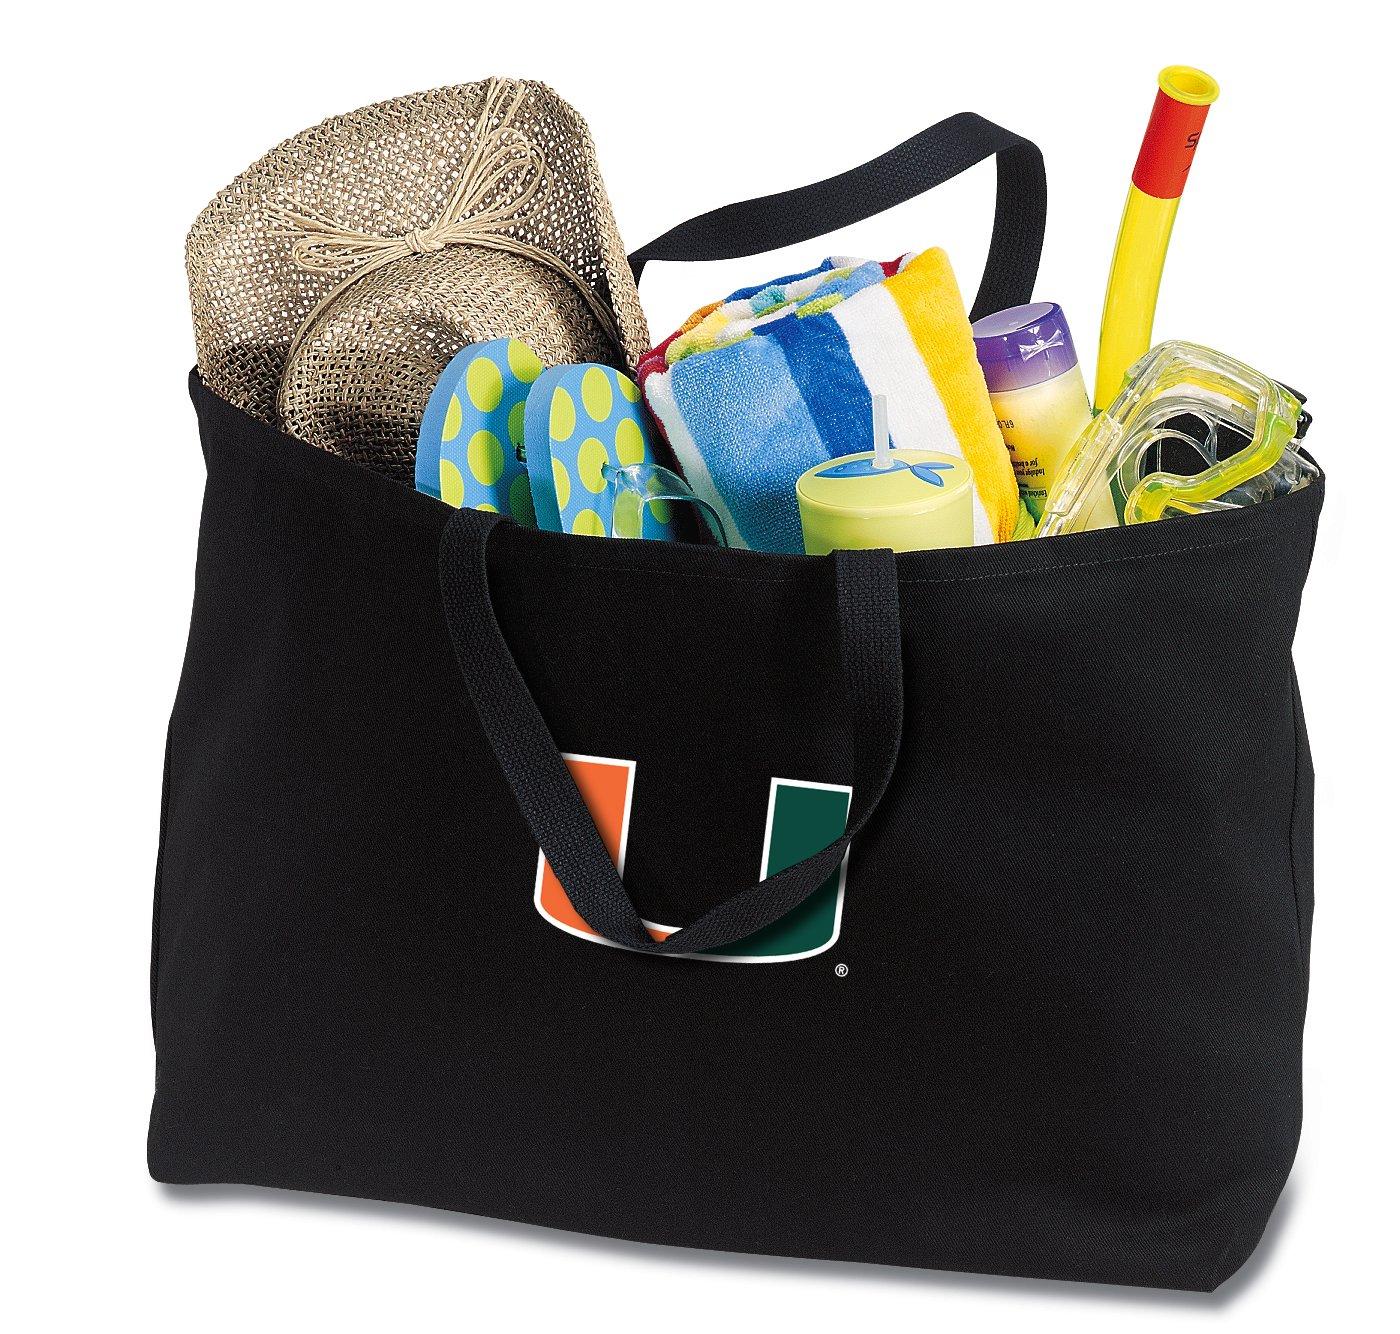 JUMBO Miami Canes Tote Bag or Large Canvas University of Miami Shopping Bag